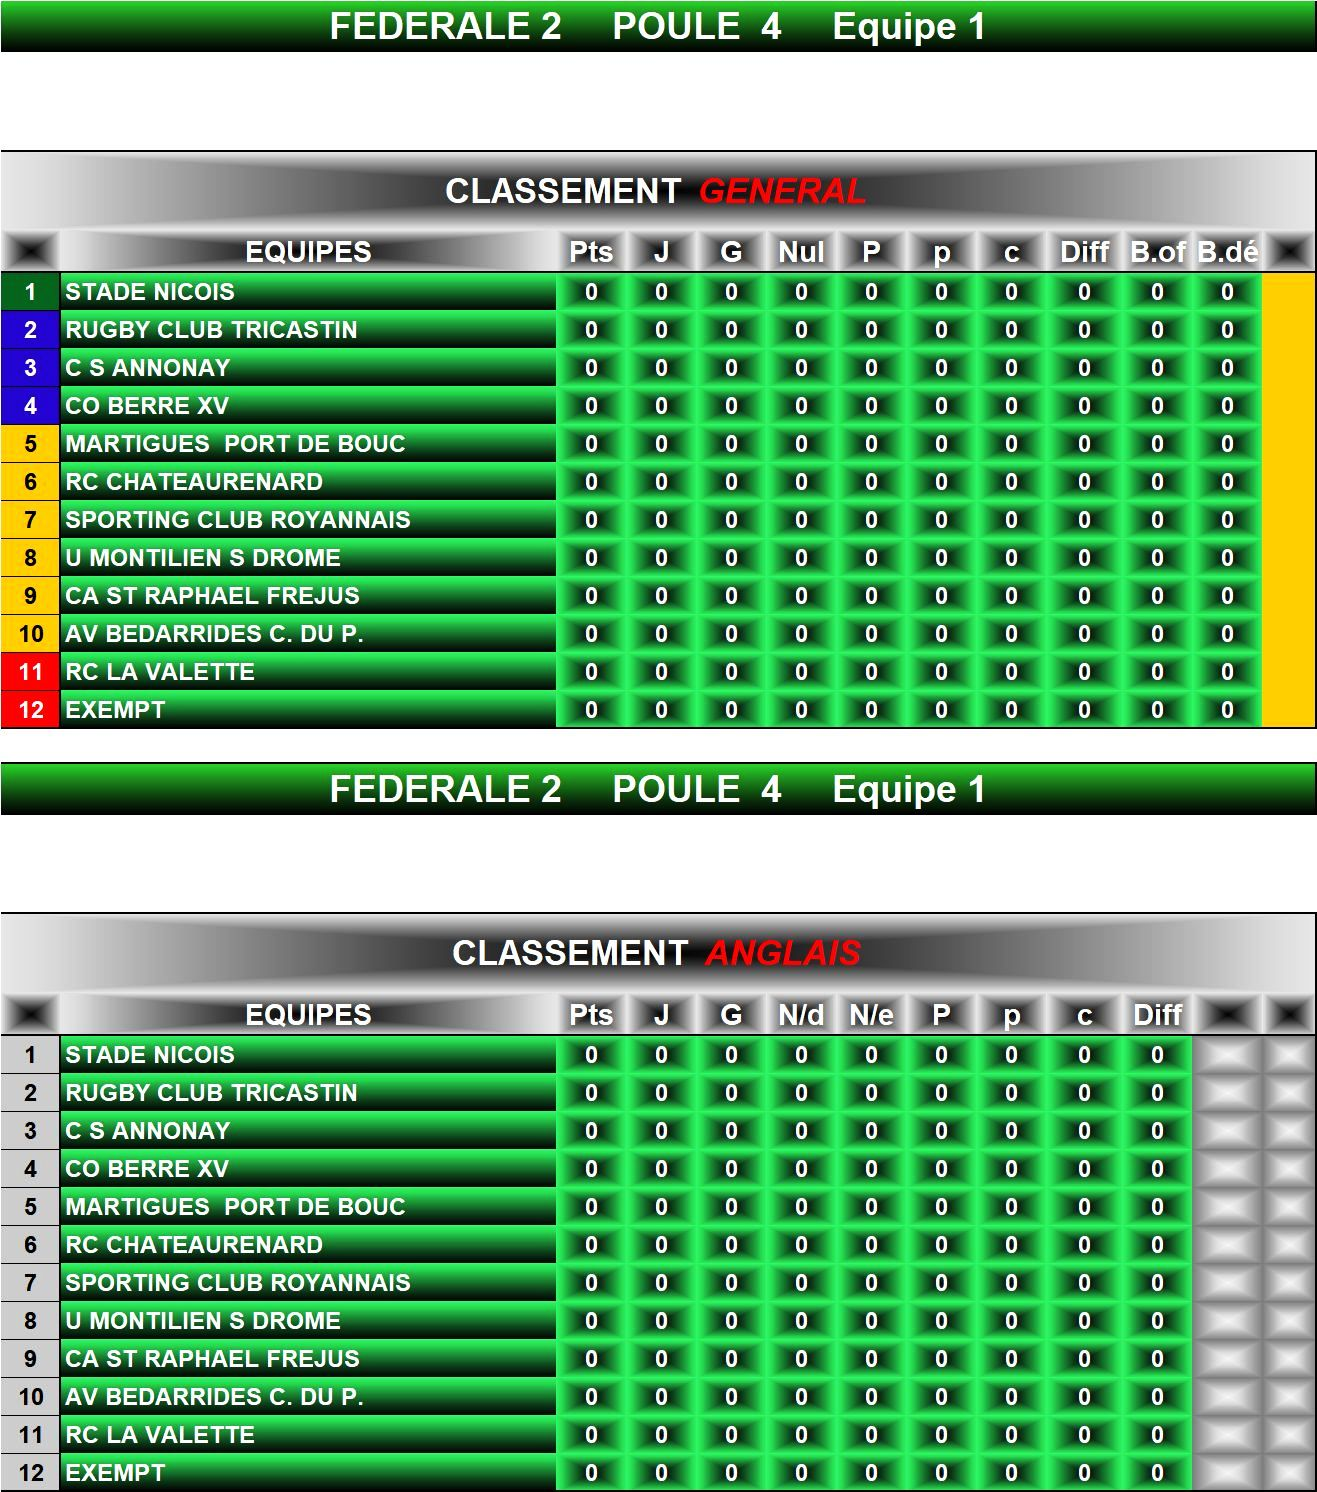 Classement Equ 1